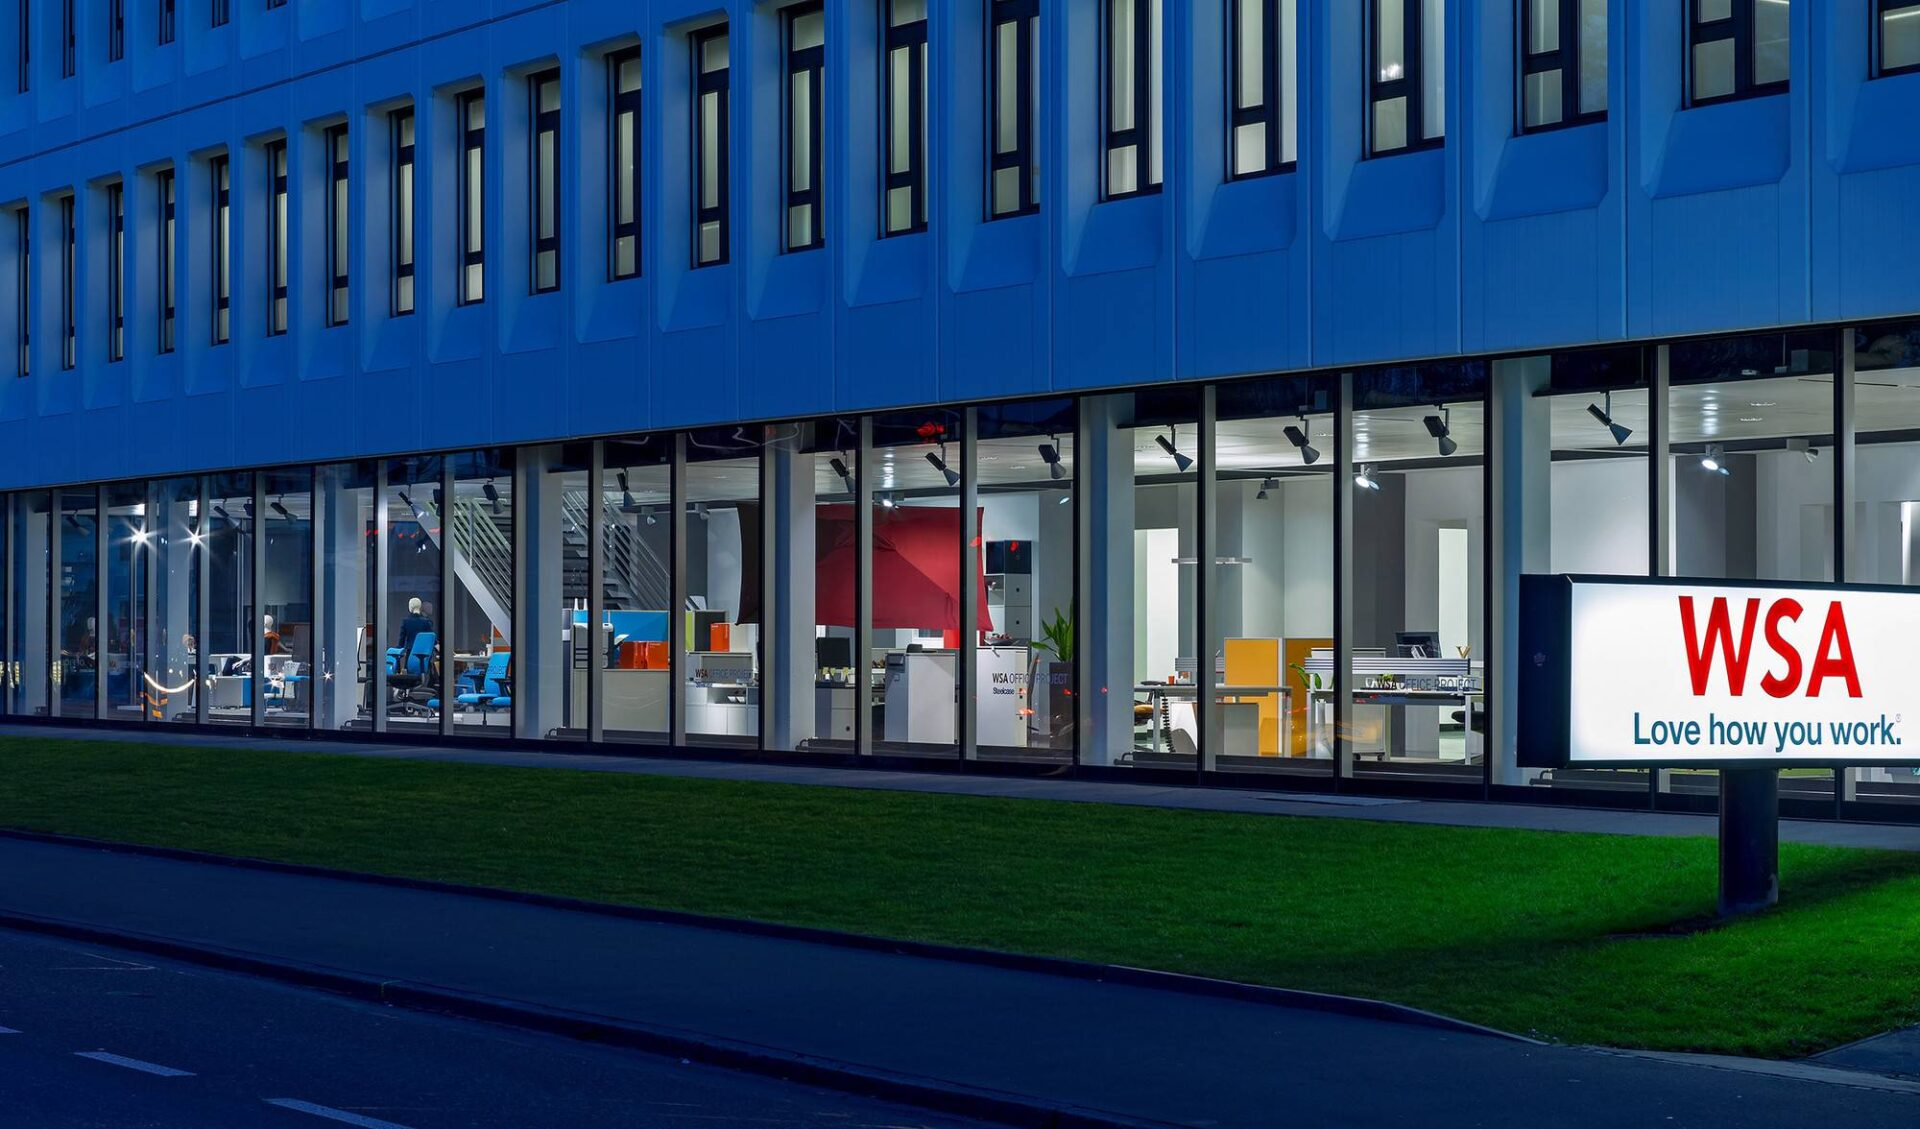 About WSA | Büroeinrichtung - Büroplanung - Innenausbau | WSA